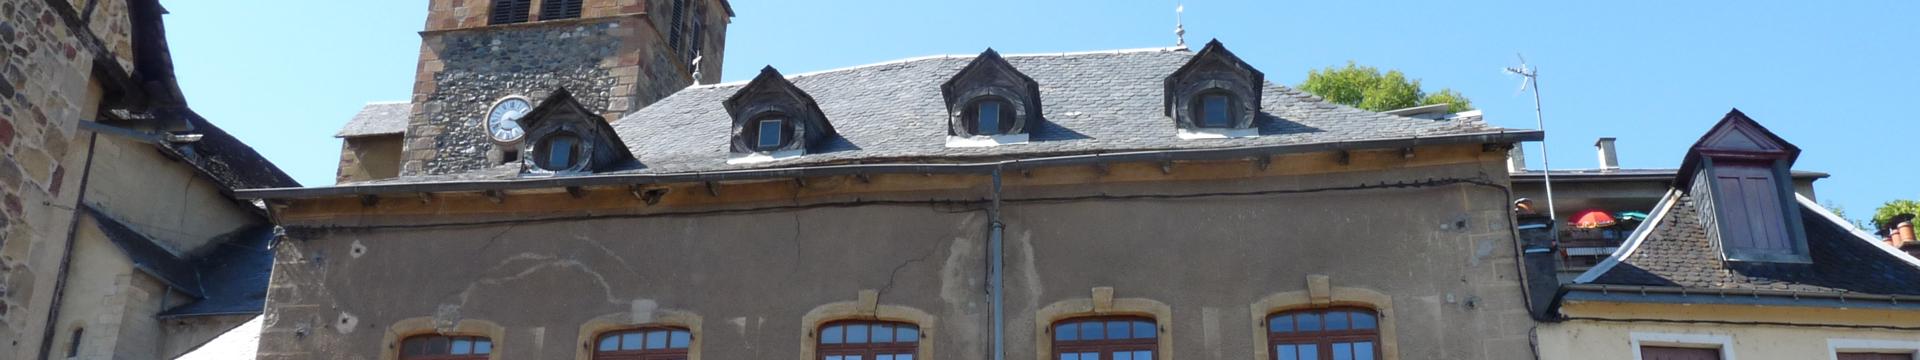 St. Geniez d'Olt